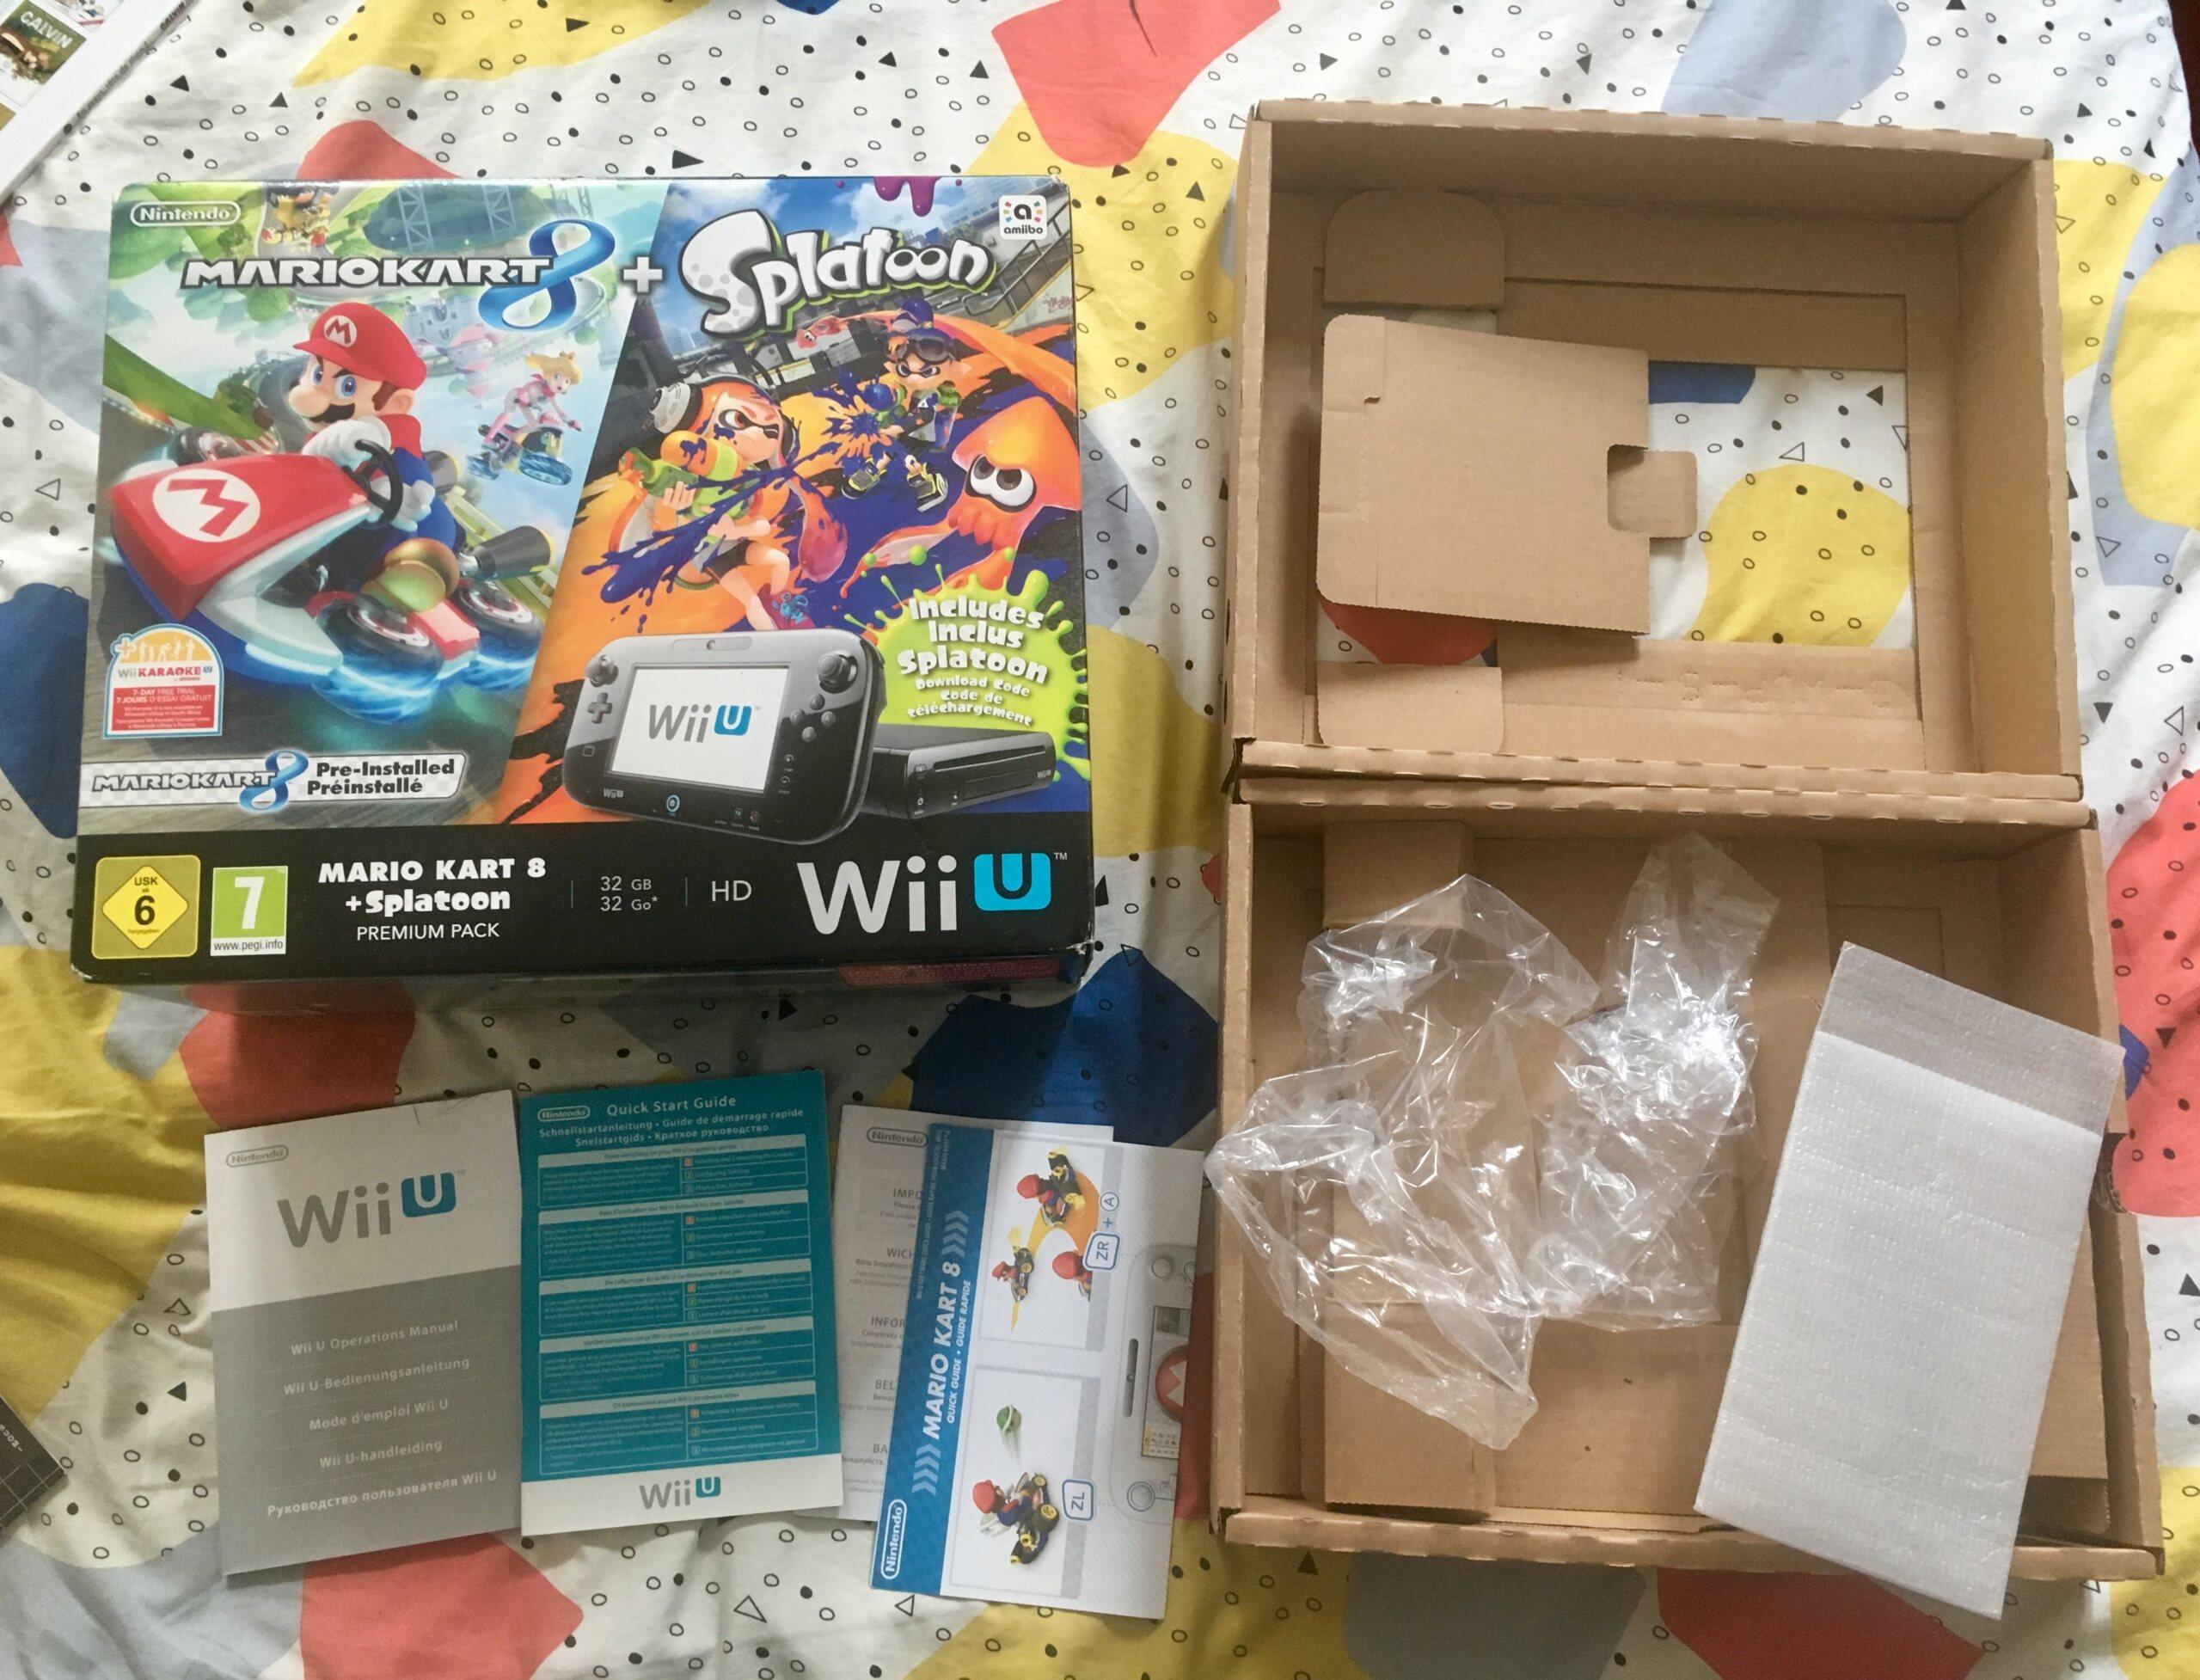 [VDS-ECH] plein d'orphelins: Boite+notice wiiU pack MKSplatoon, Notice Megadrive N64 Ps1, Boite notice R-Types, Pokemon Img_3719